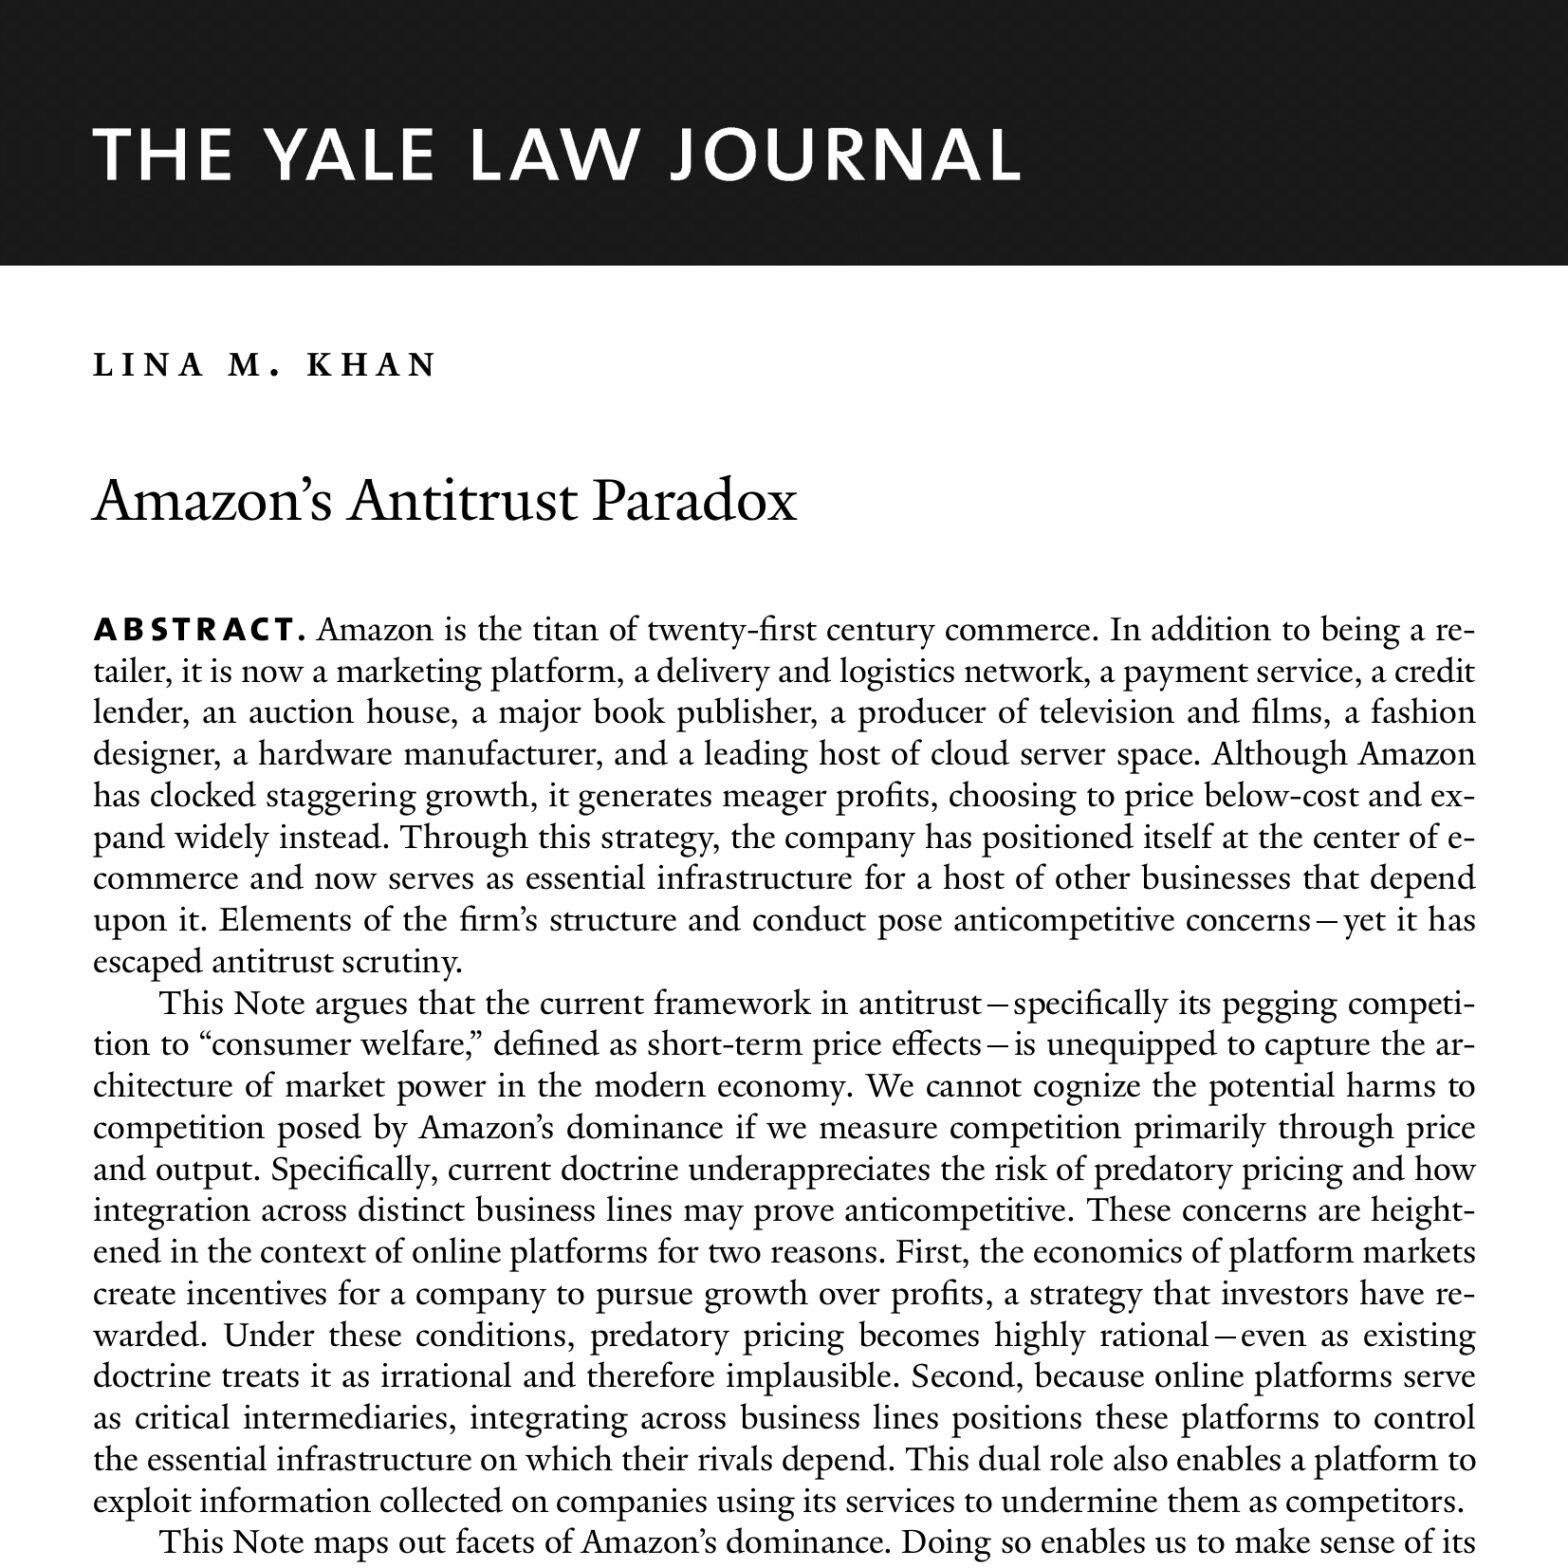 Lina Khan Yale Law Journal Amazon Antitrust Paradox